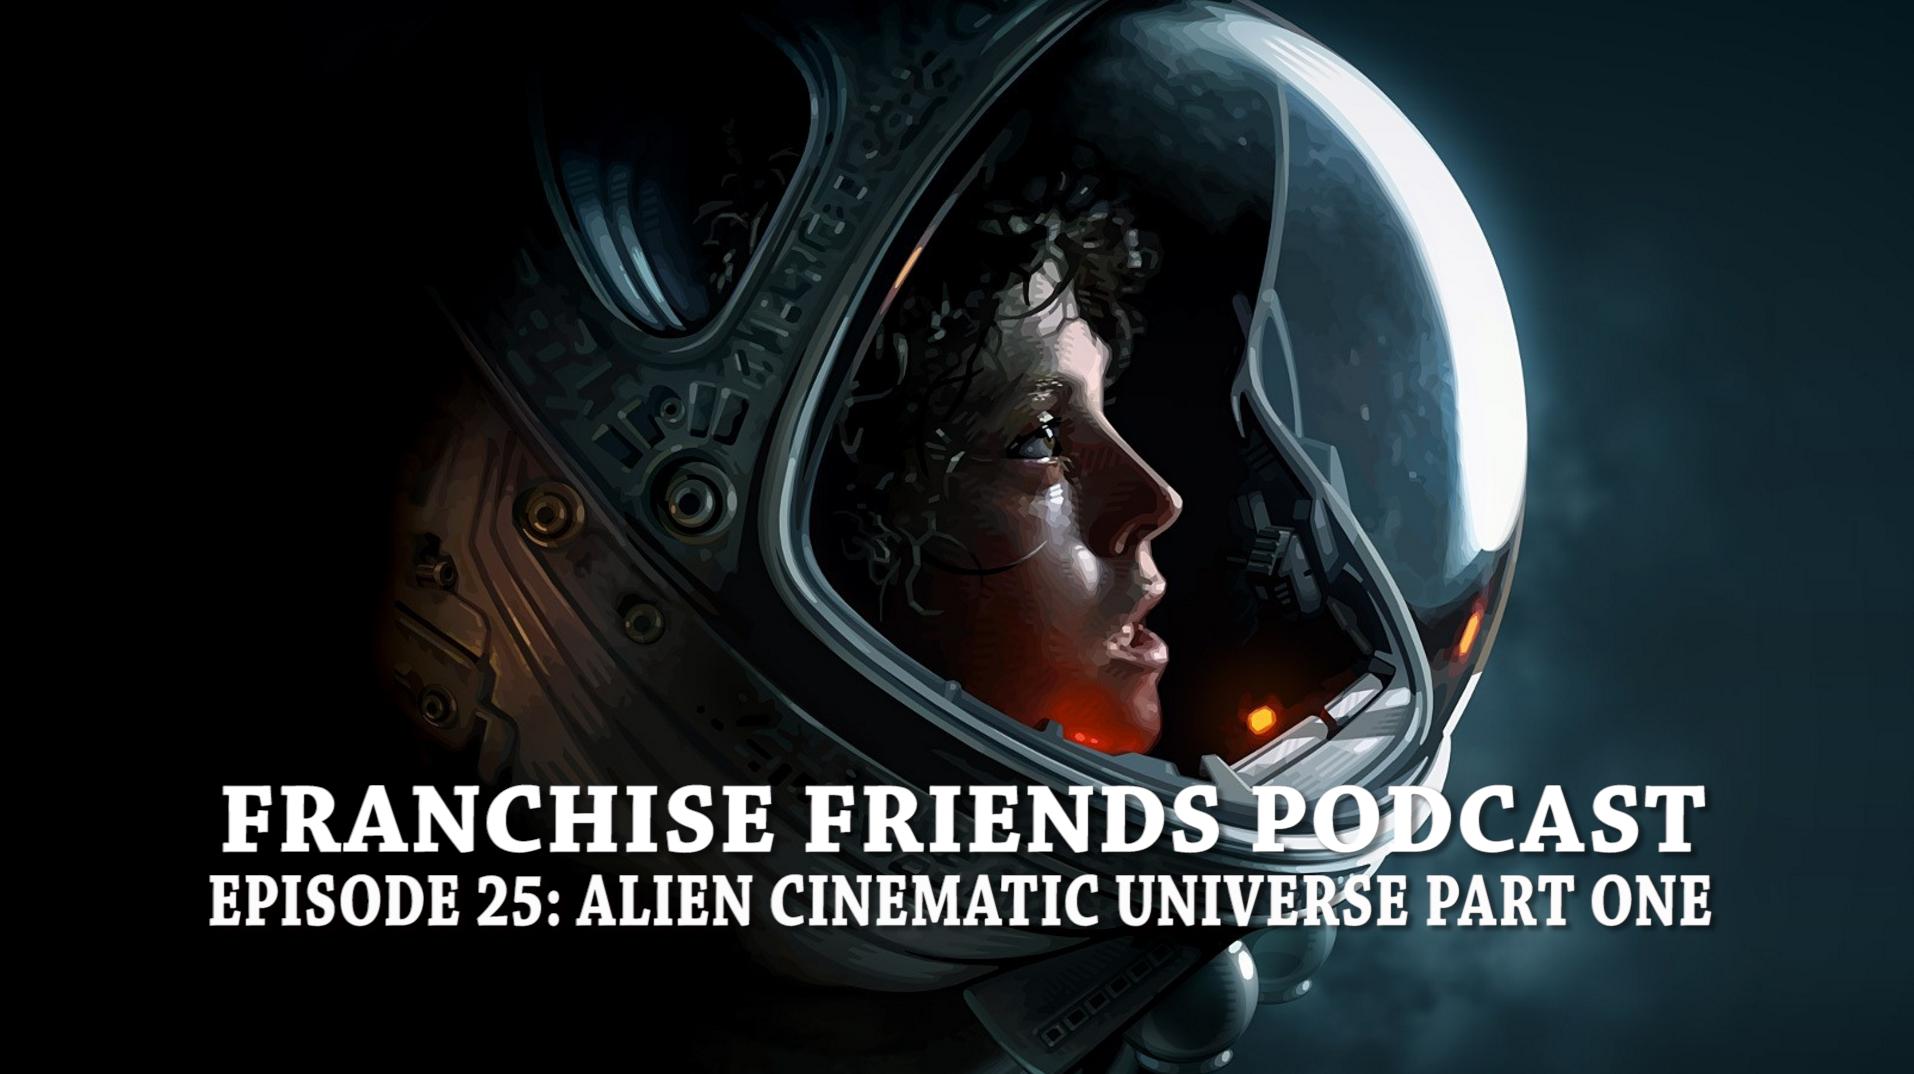 alien franchise friends